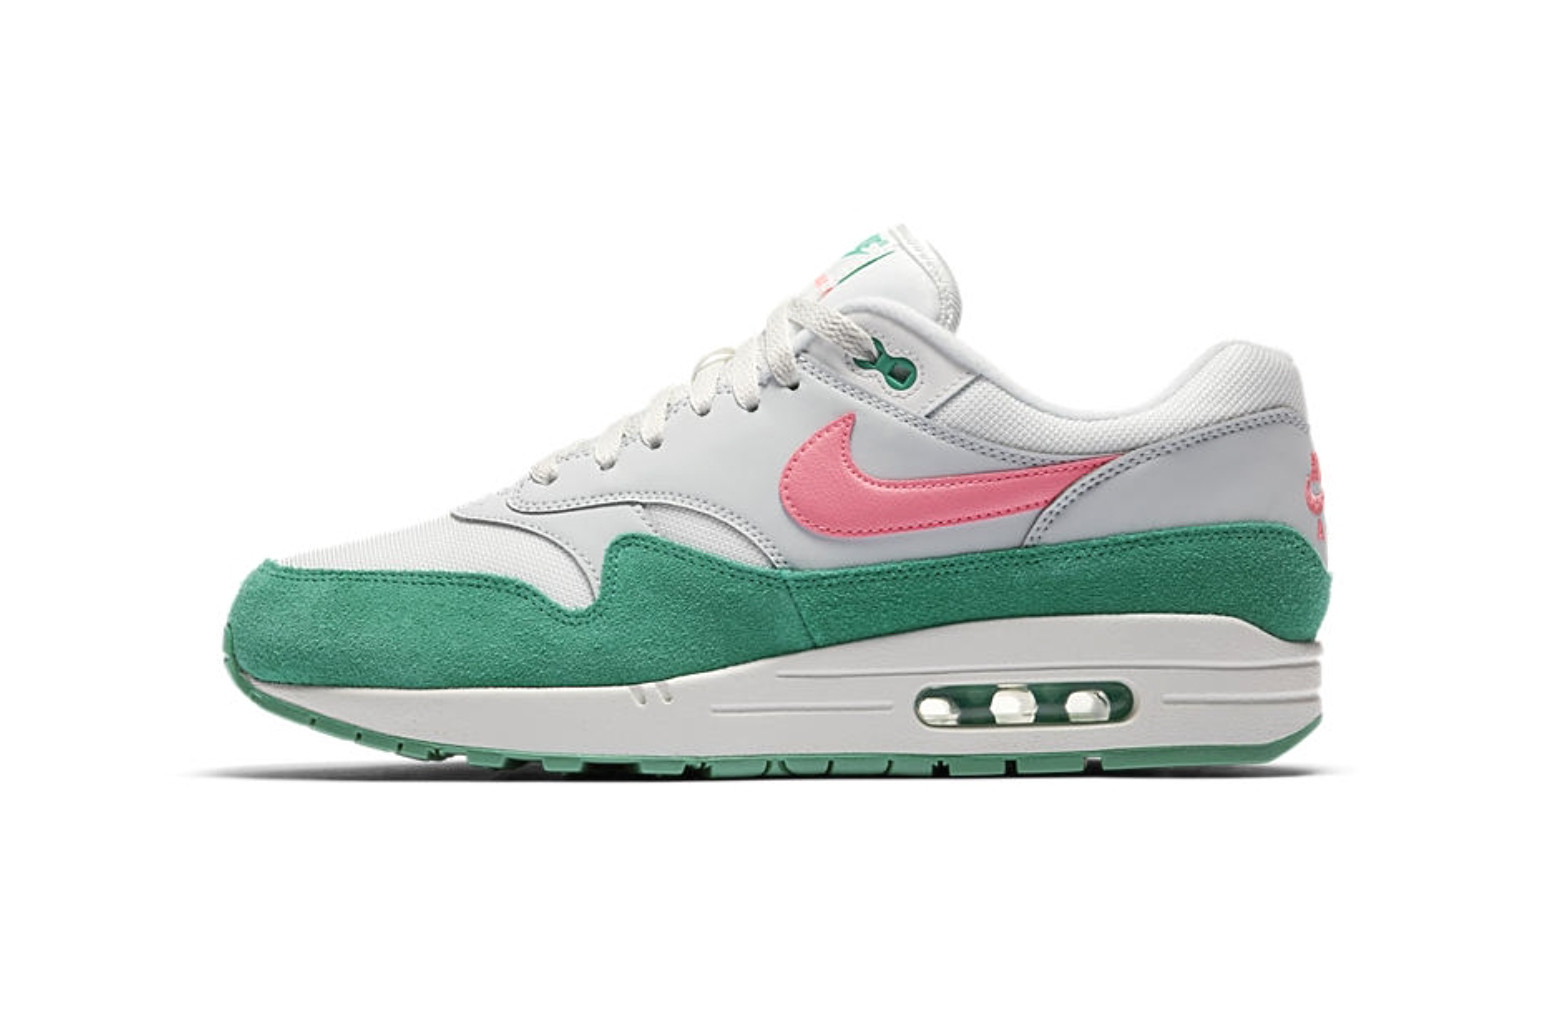 Nike Air Max 1 in Grey/Pink/Green